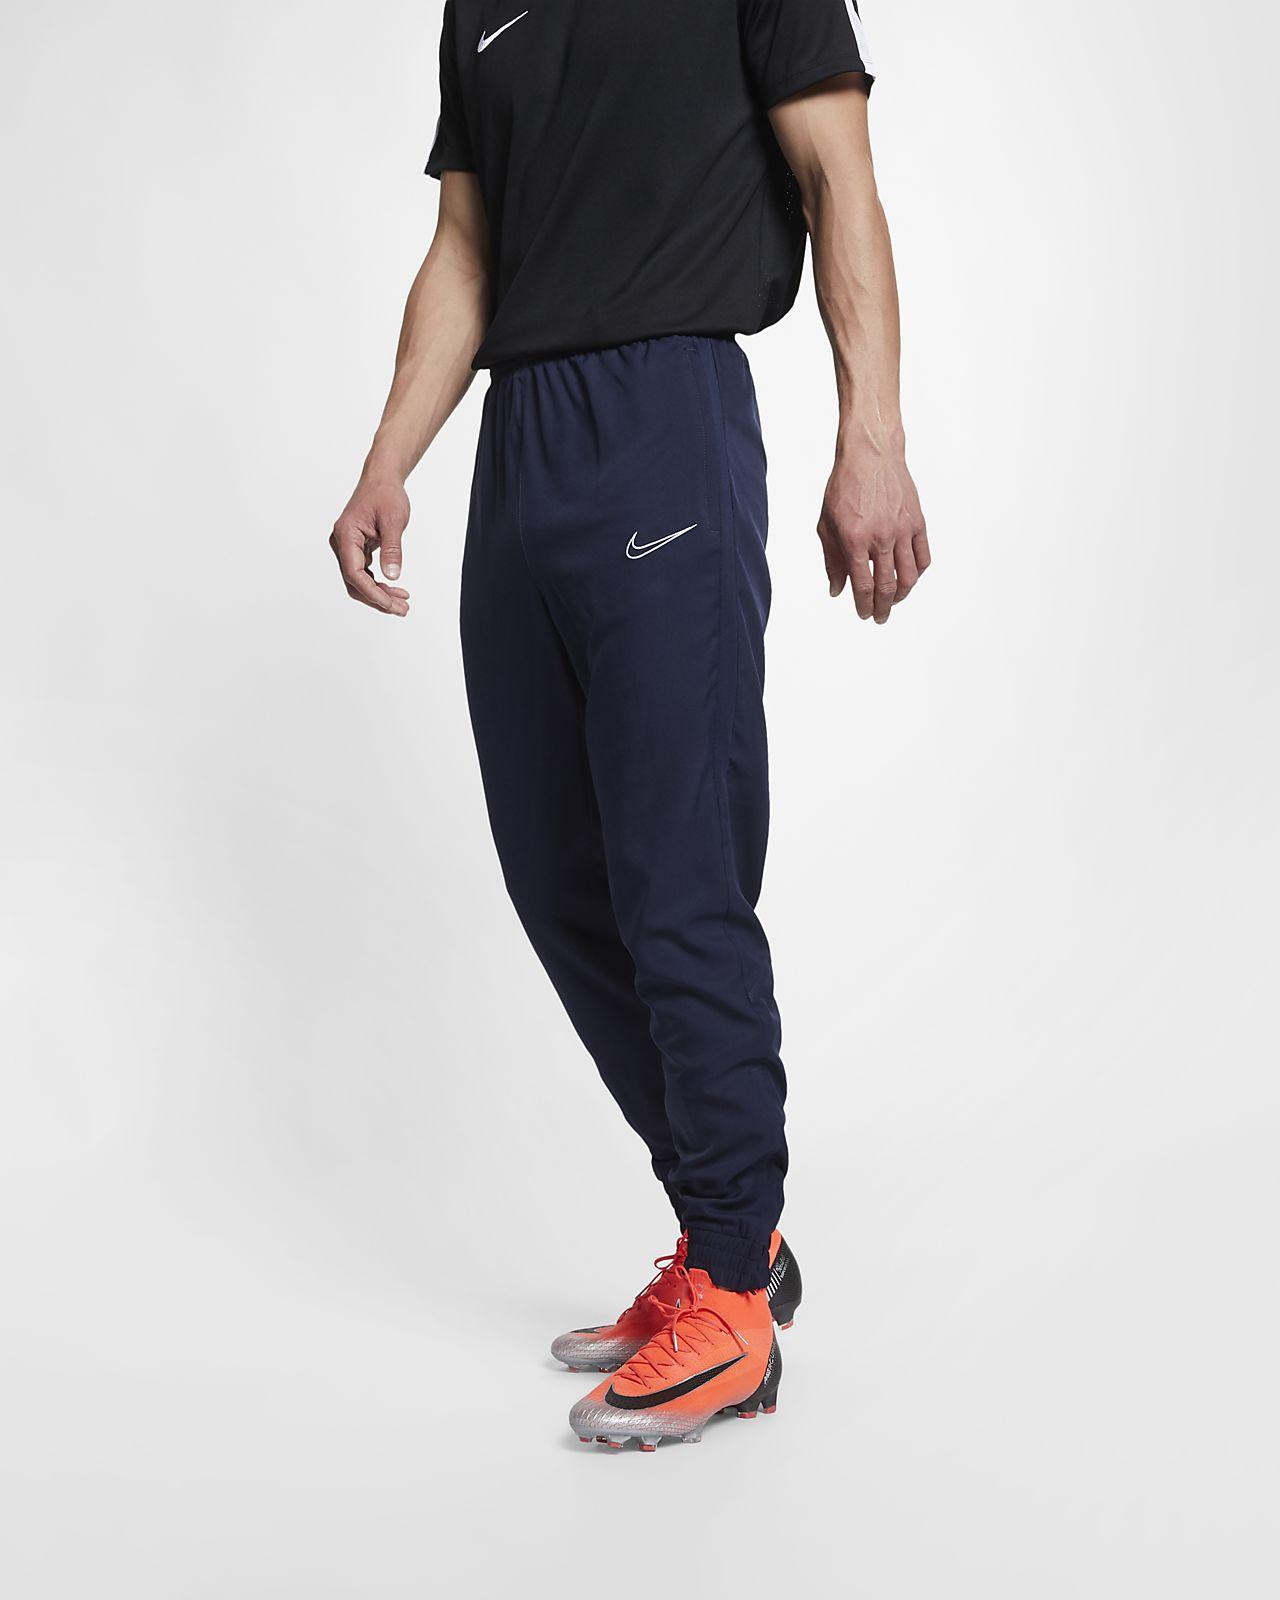 Nike Dri-FIT Academy Pantalón de fútbol - Hombre. Nike.com ES 102ee7aa71e28